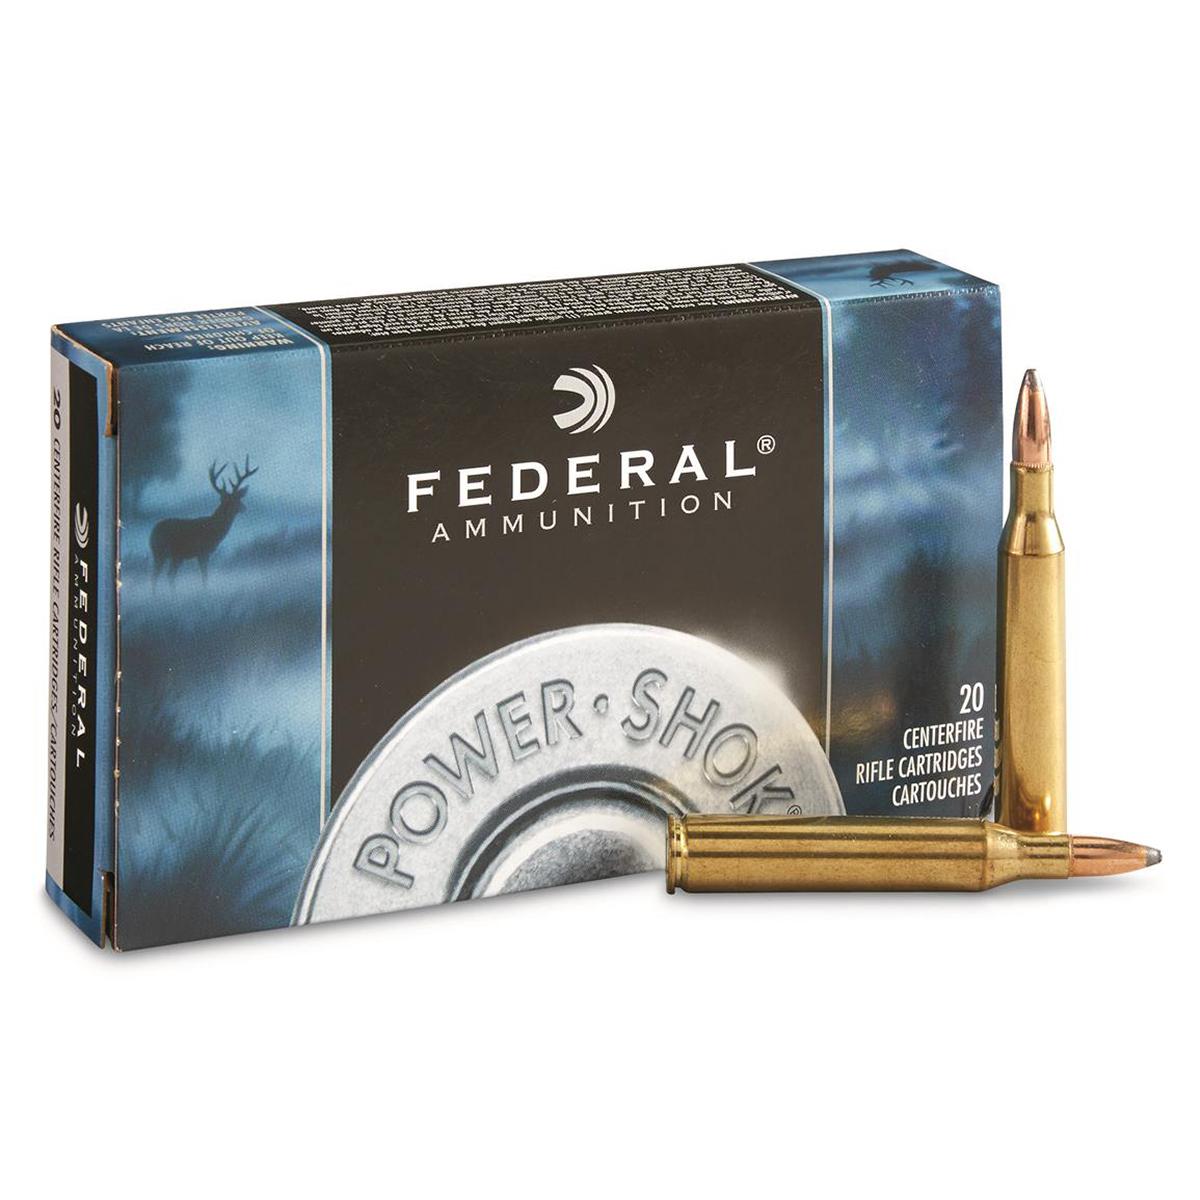 Federal Power-Shok Rifle Ammo, .300 Win Mag, 180-gr, JSP